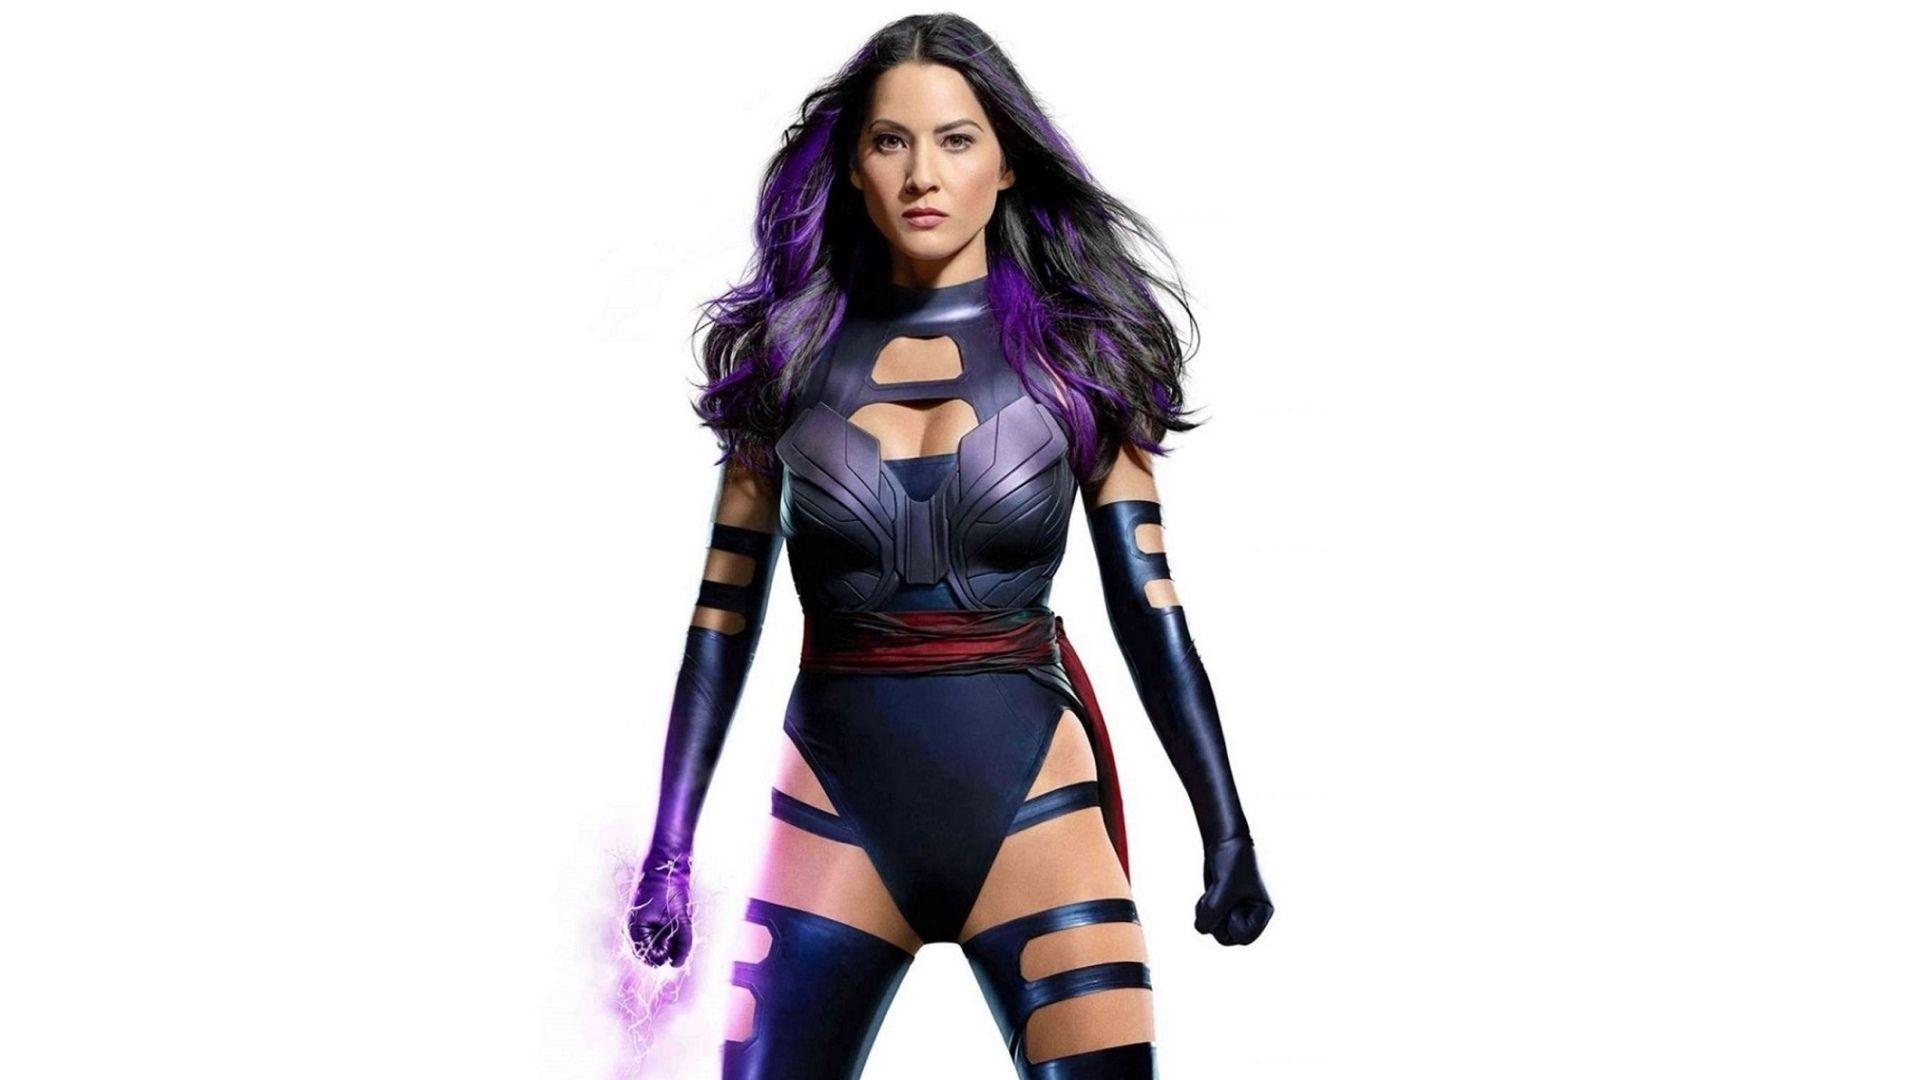 Sony Xperia sony xperia z2 phone case : Movie X-Men: Apocalypse Olivia Munn Psylocke Wallpaper : Olivia Munn ...